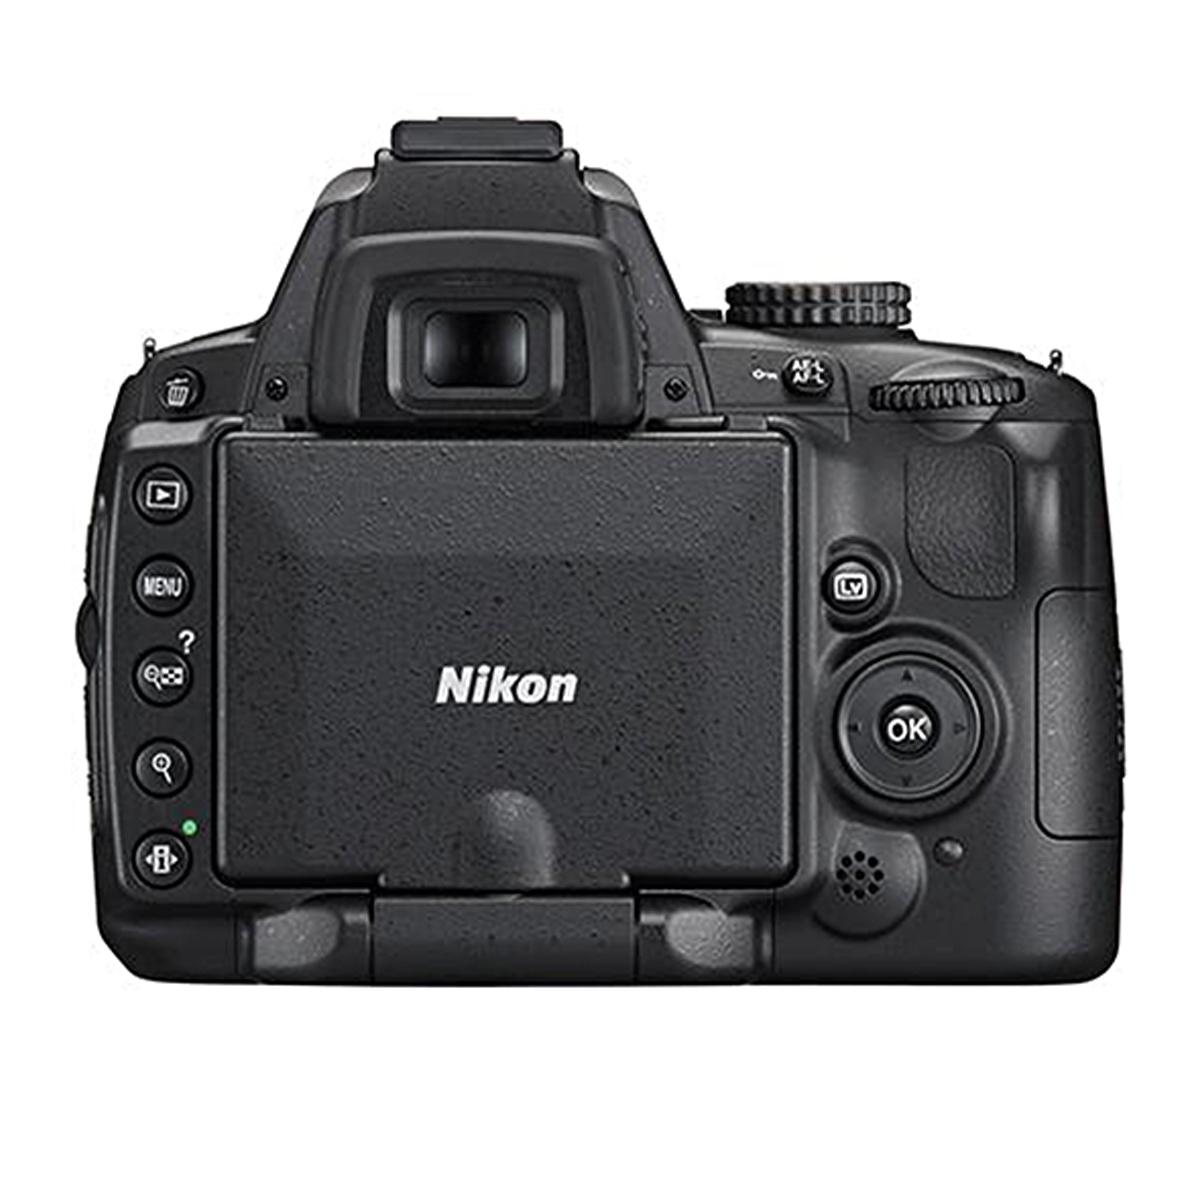 D5000 Digital SLR Camera Body - Manufacturer Reconditioned